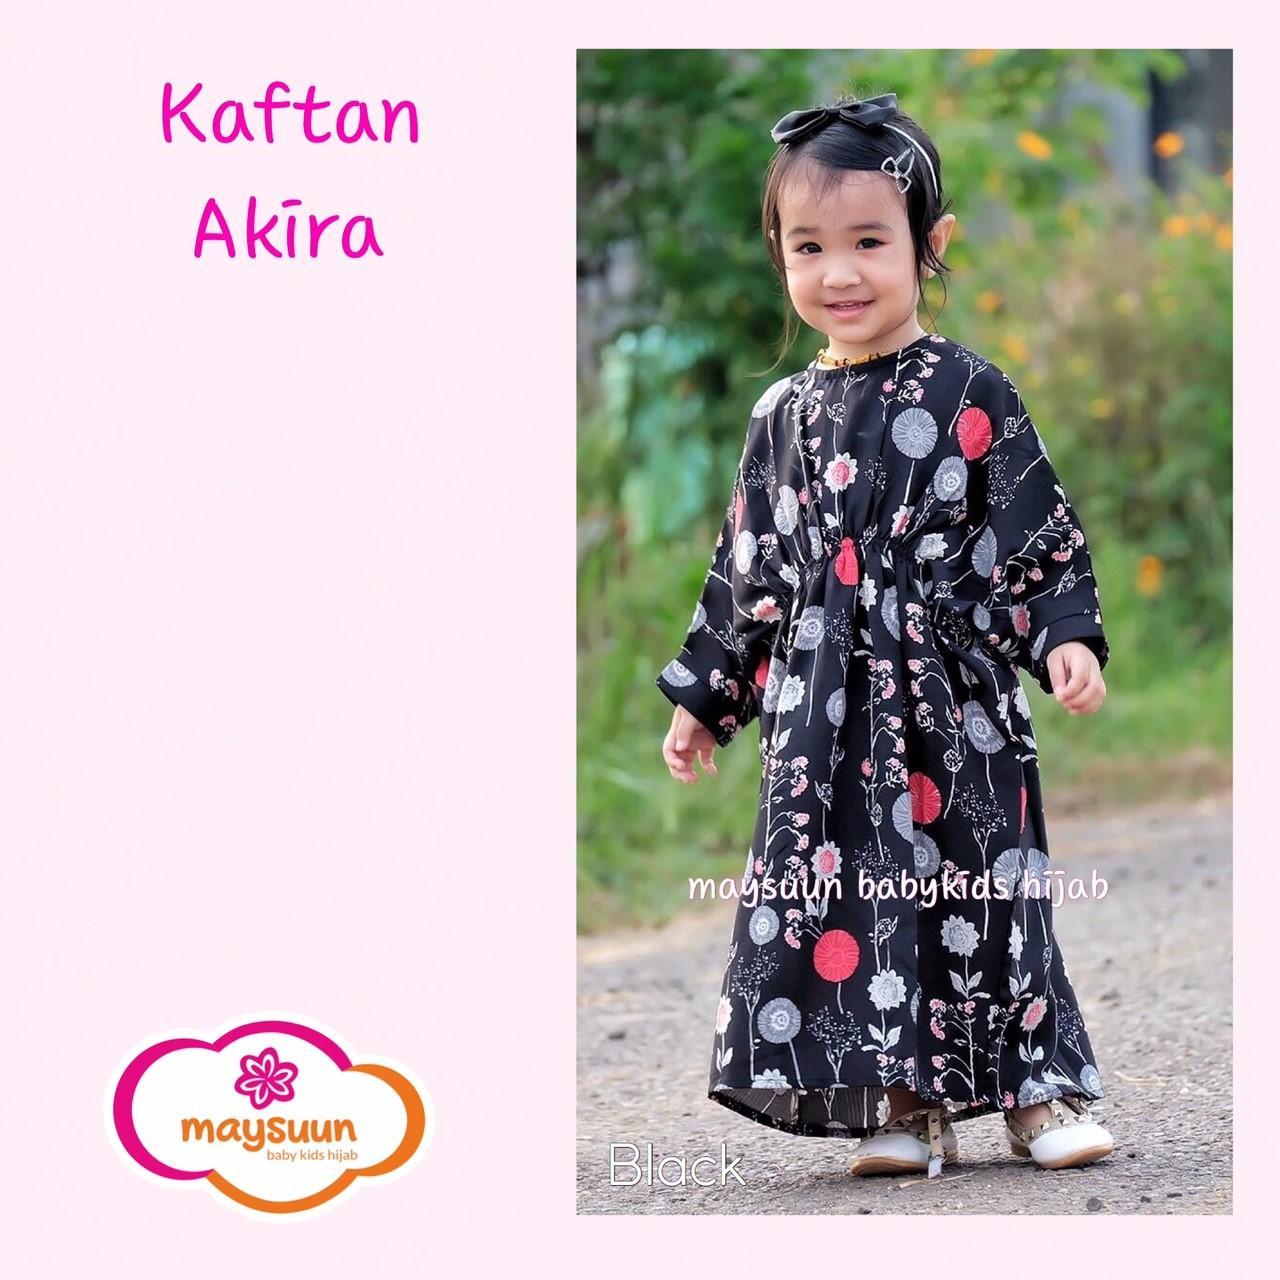 3e9649d42daa542470ae3d4c404c8a9a Review Daftar Harga Busana Muslim Model Kimono Terbaru Terbaik tahun ini